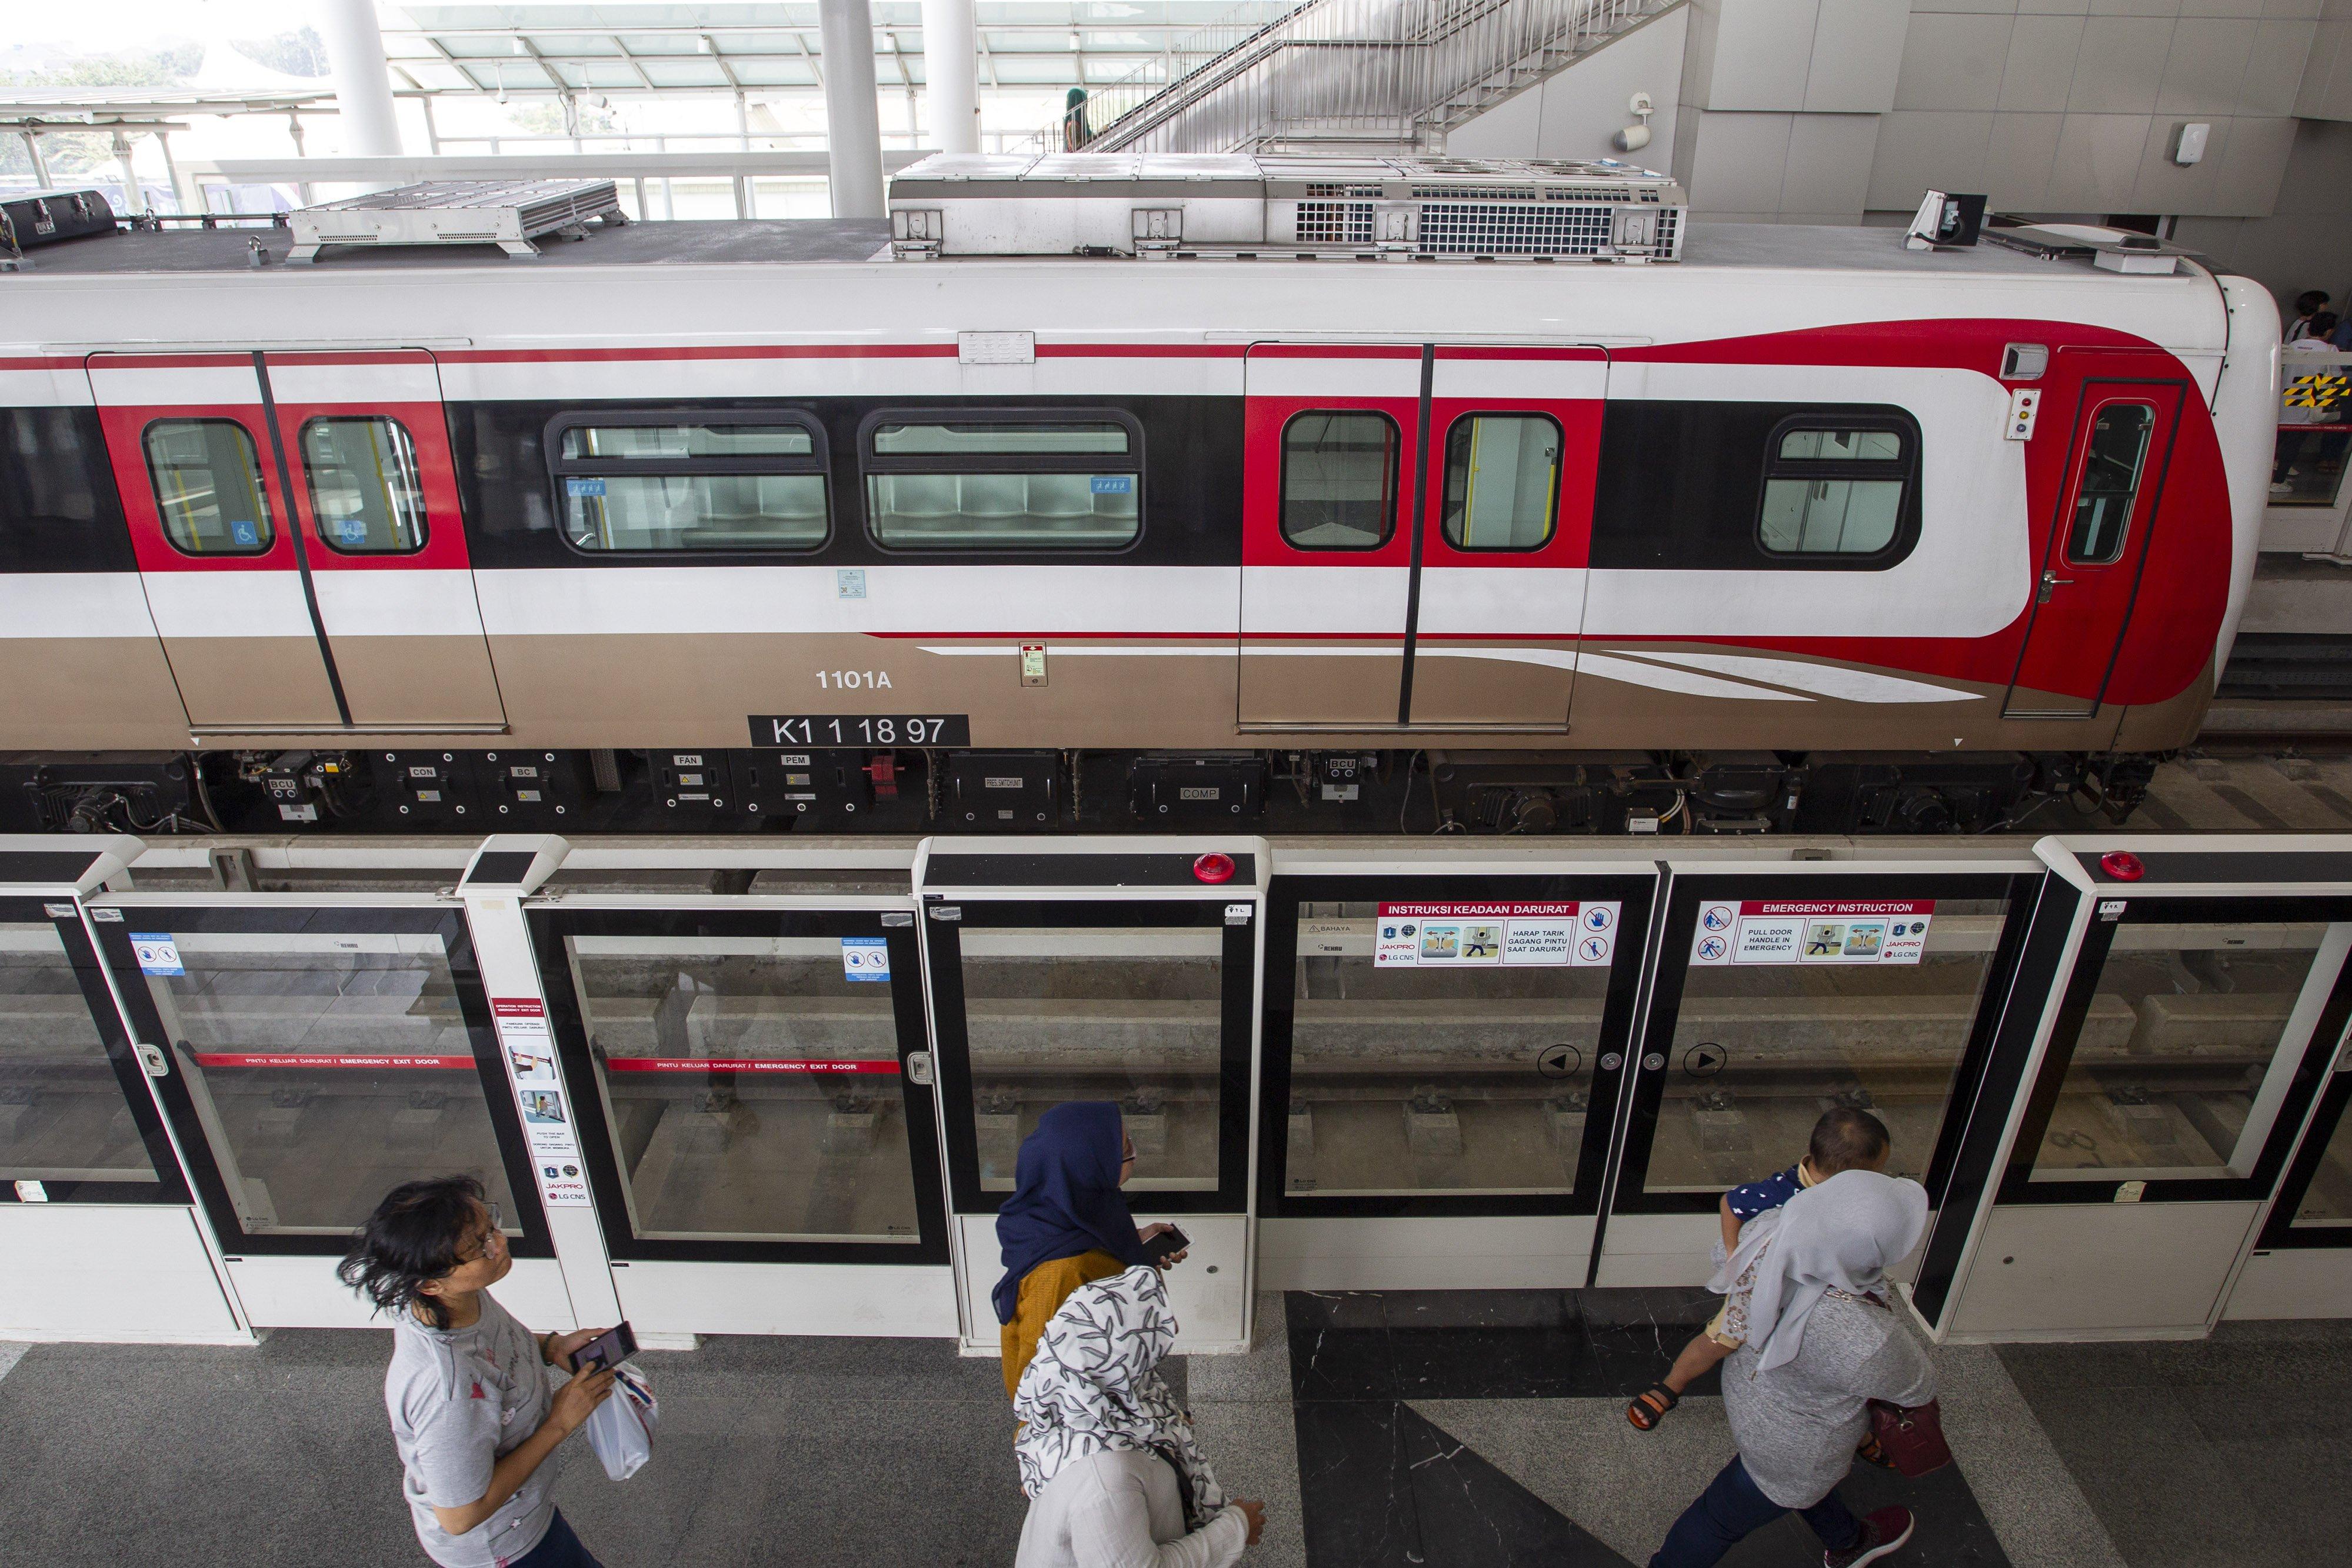 Masyarakat bersiap mencoba kereta Light Rail Transit (LRT) saat uji publik di Stasiun Boulevard Utara, Kelapa Gading, Jakarta, Selasa (11/6/2019).